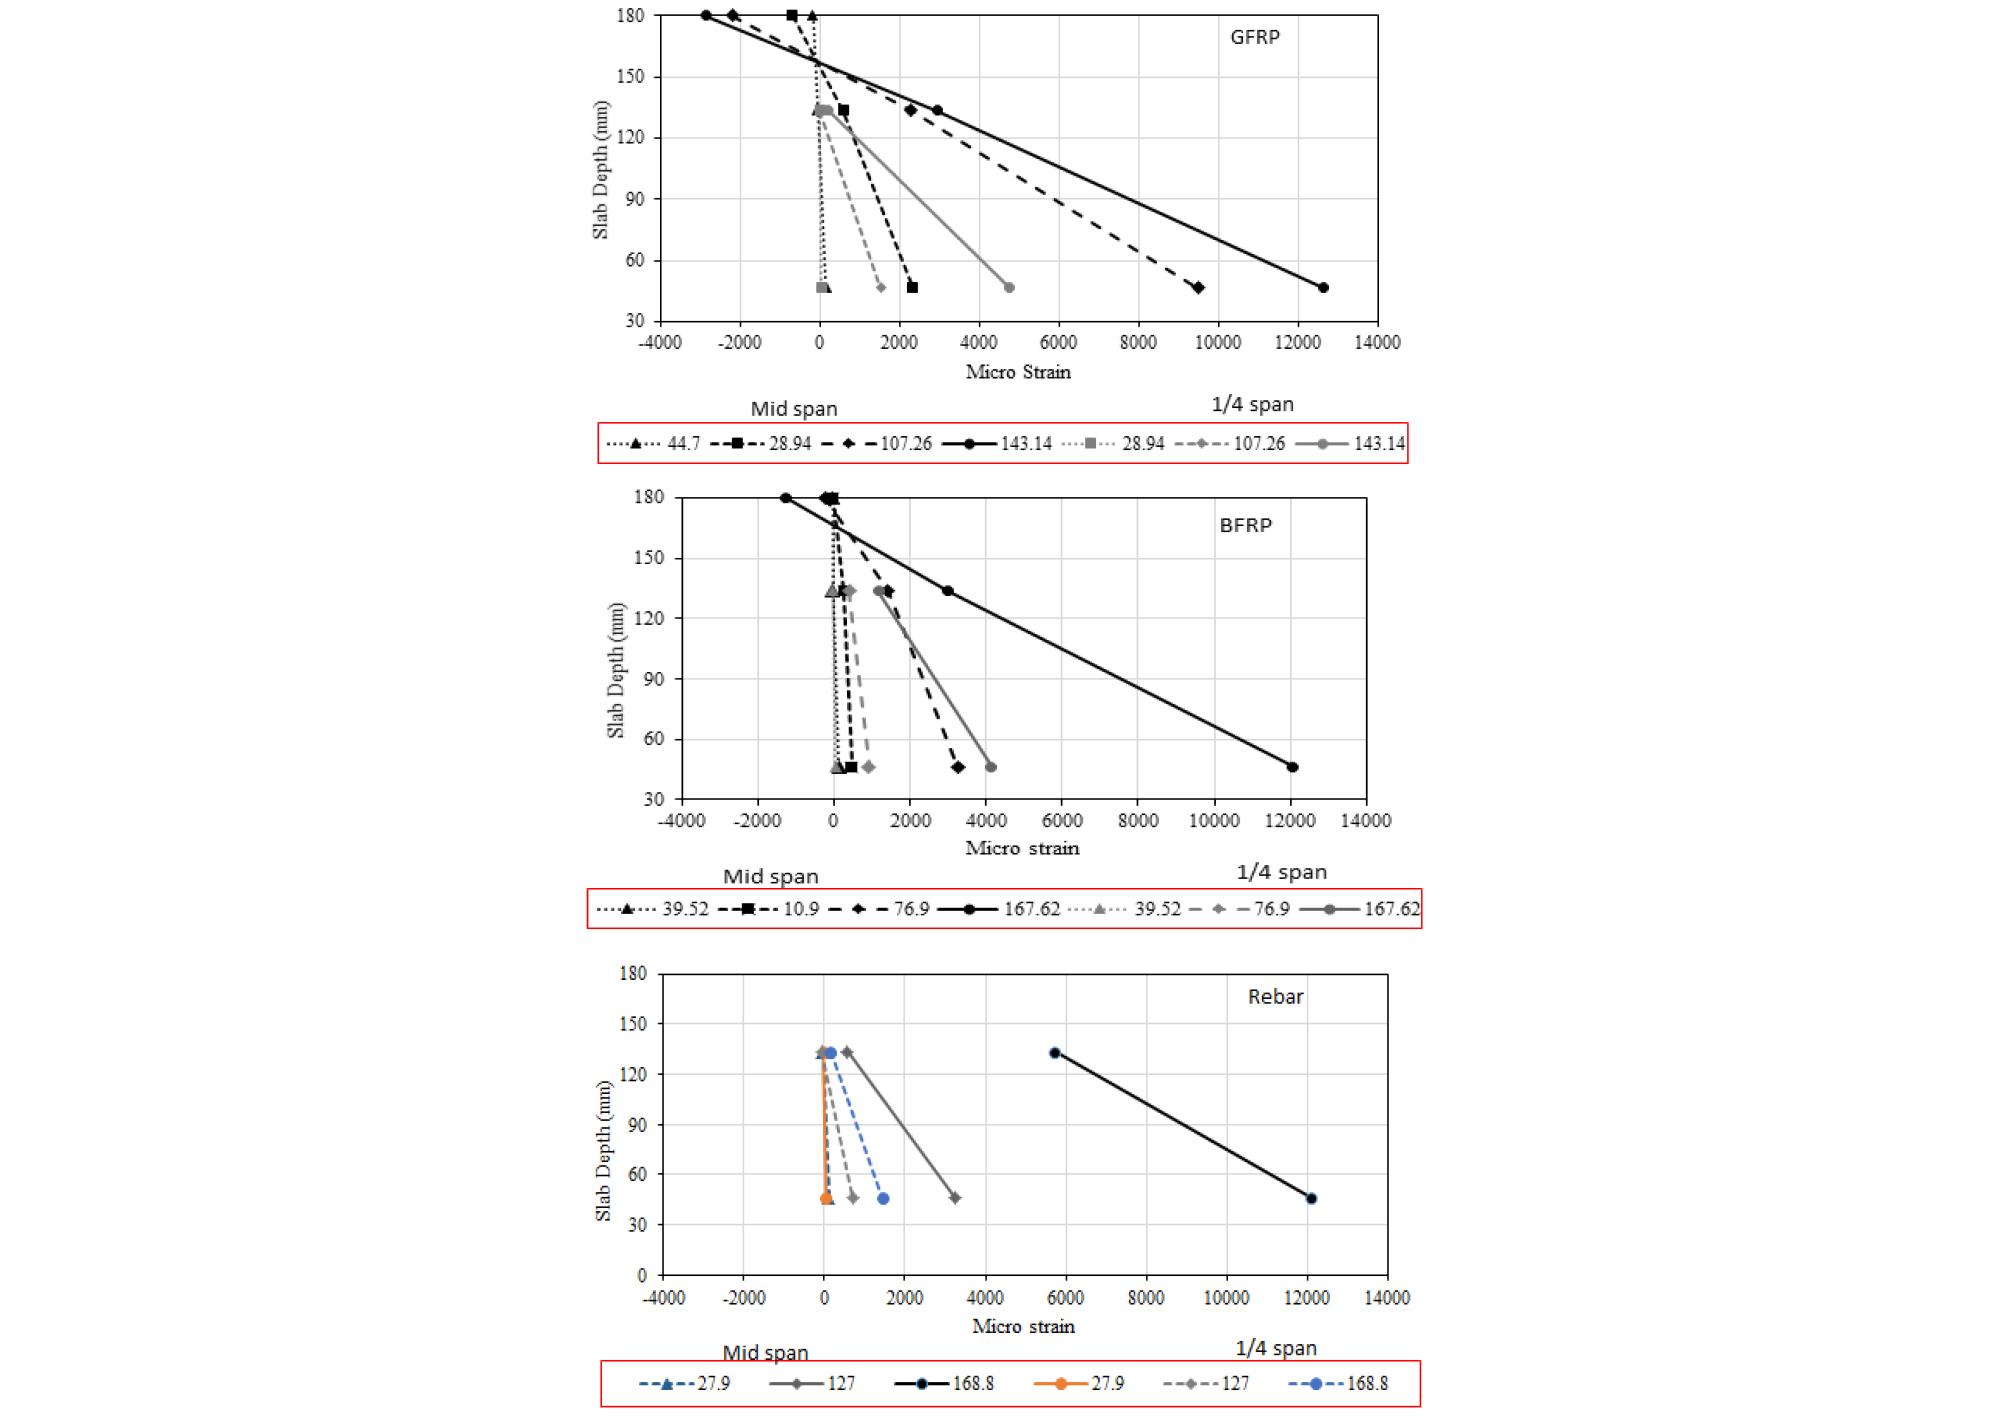 http://static.apub.kr/journalsite/sites/ksce/2020-040-04/N0110400403/images/Figure_KSCE_40_04_03_F6.jpg